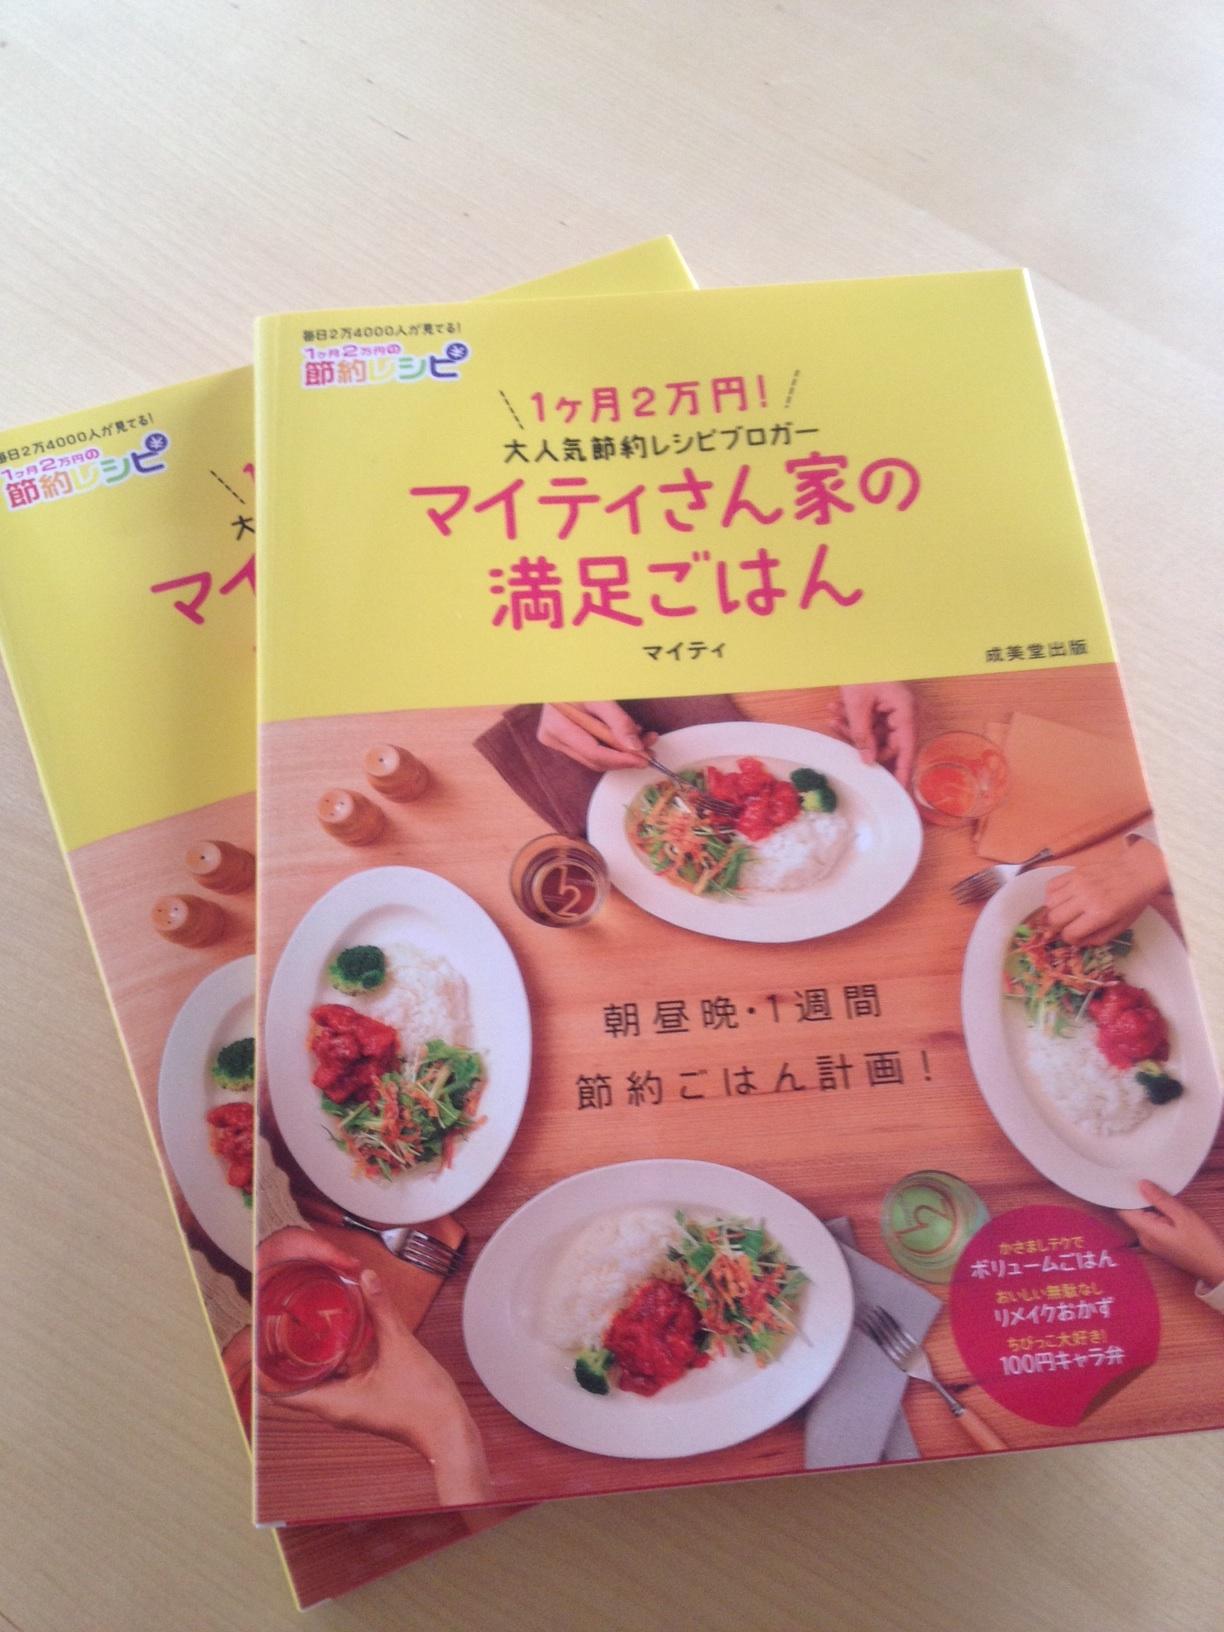 http://sorakikaku.com/maruyamamiki/files/0316-7.jpg